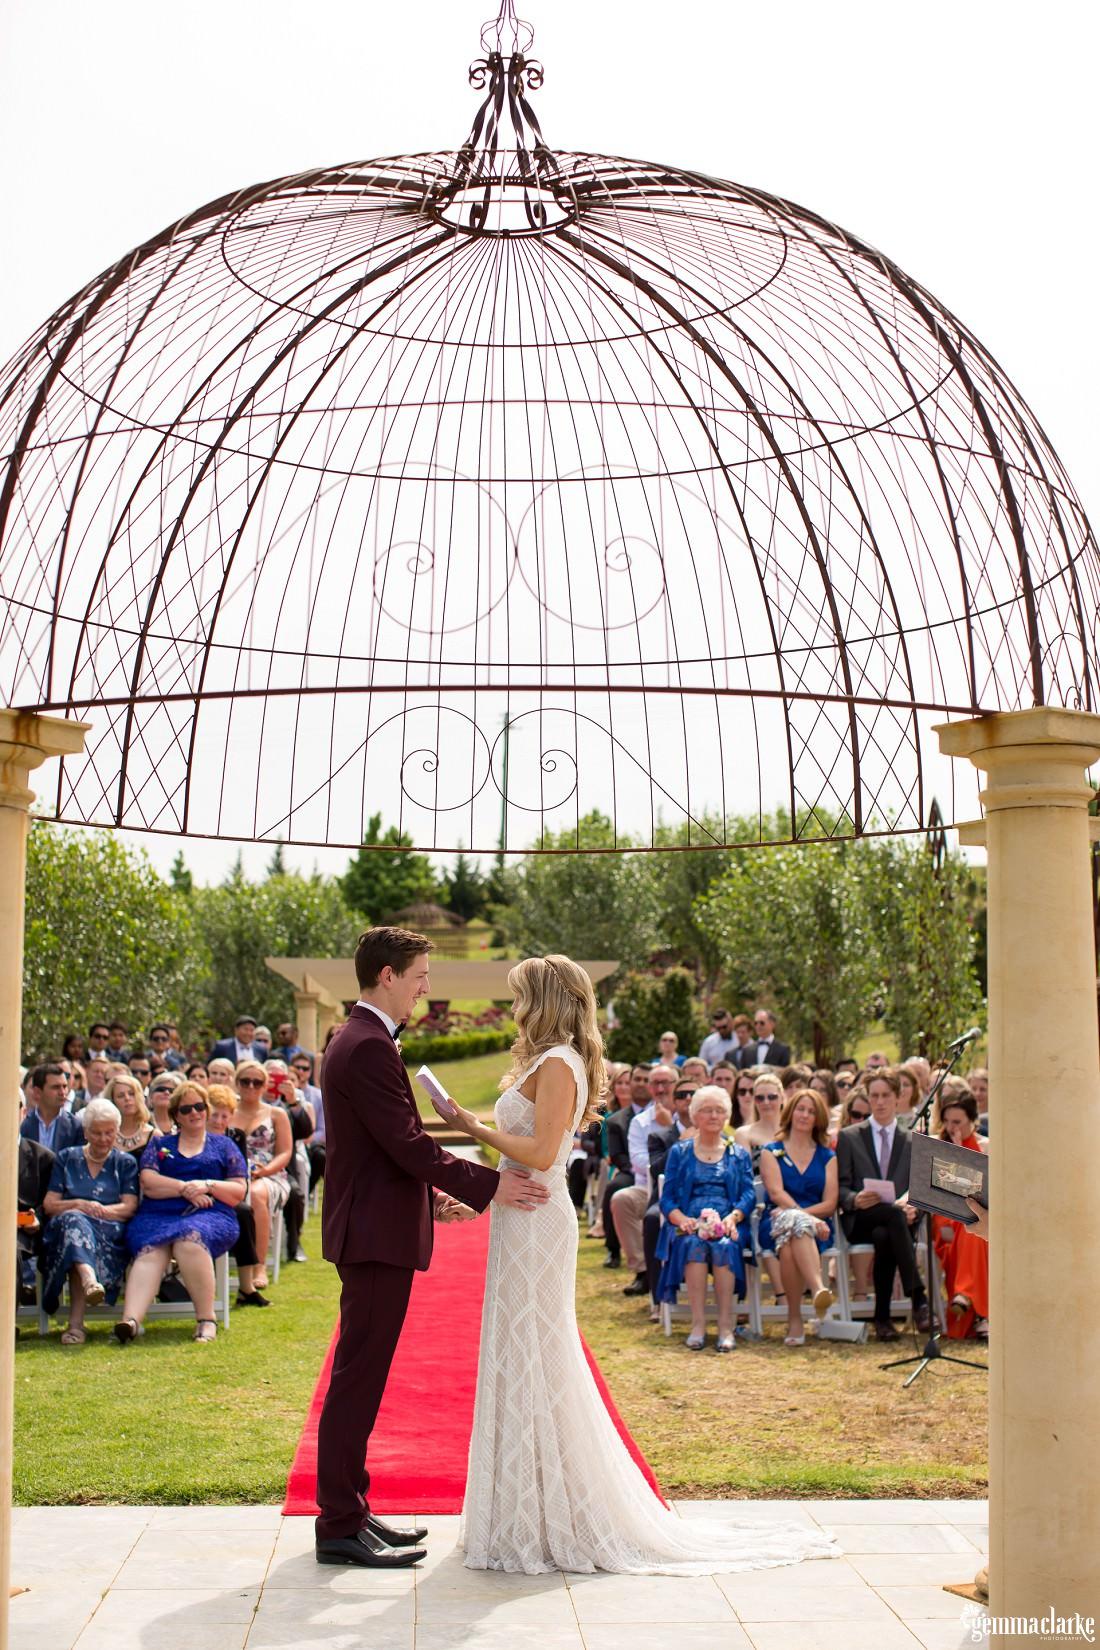 gemmaclarkephotography_sheldonbrook-wedding_country-wedding_lauren-and-mitchell_0040